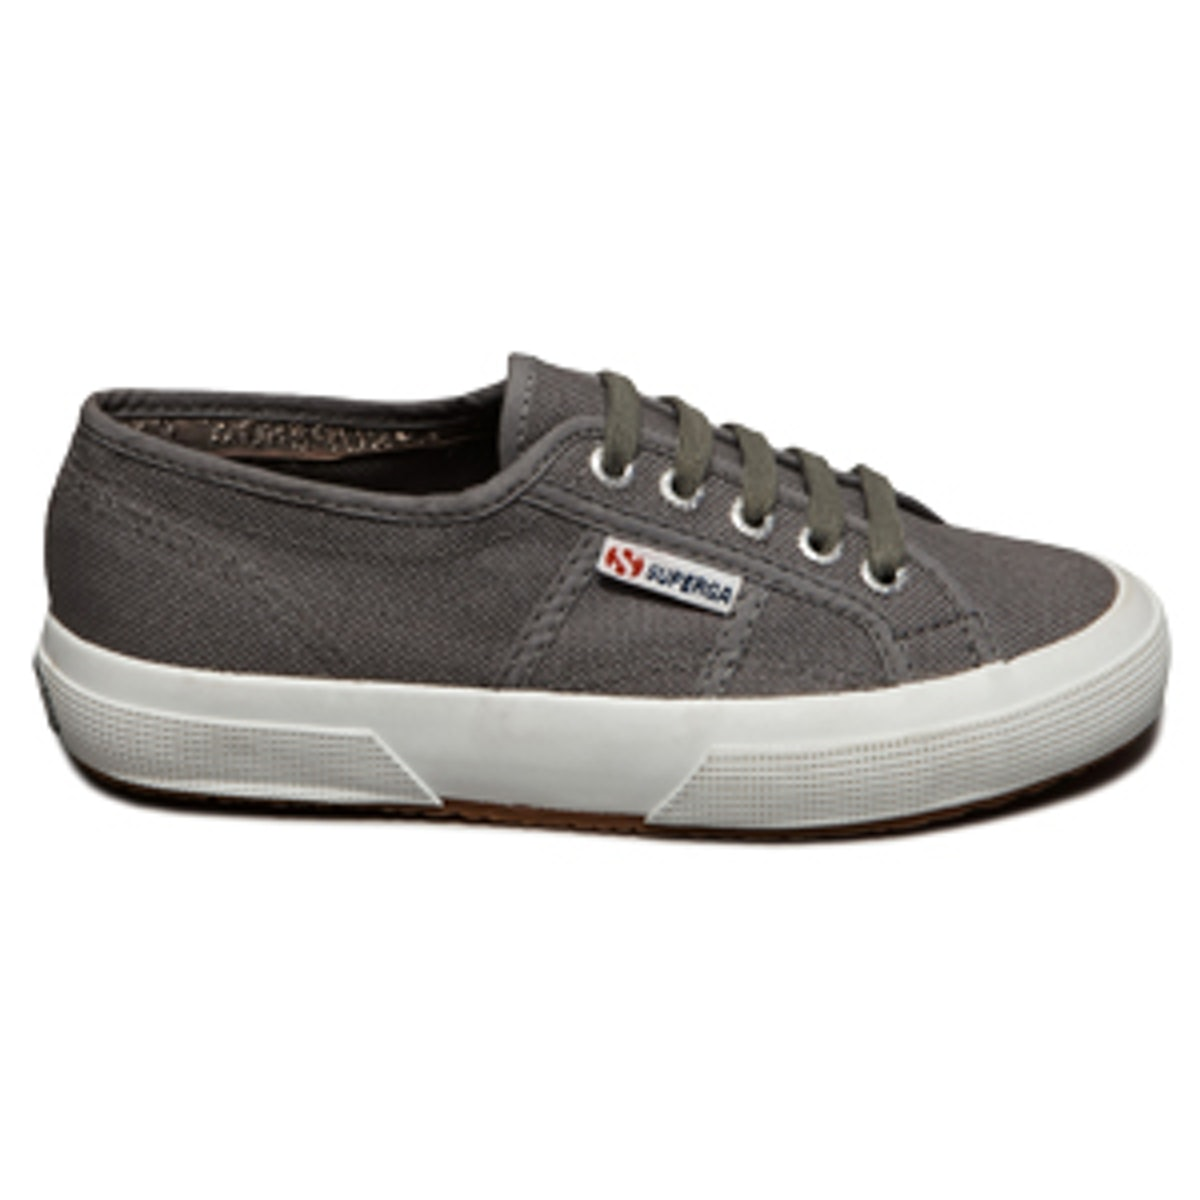 2750 Cotu Classic in Grey Sage